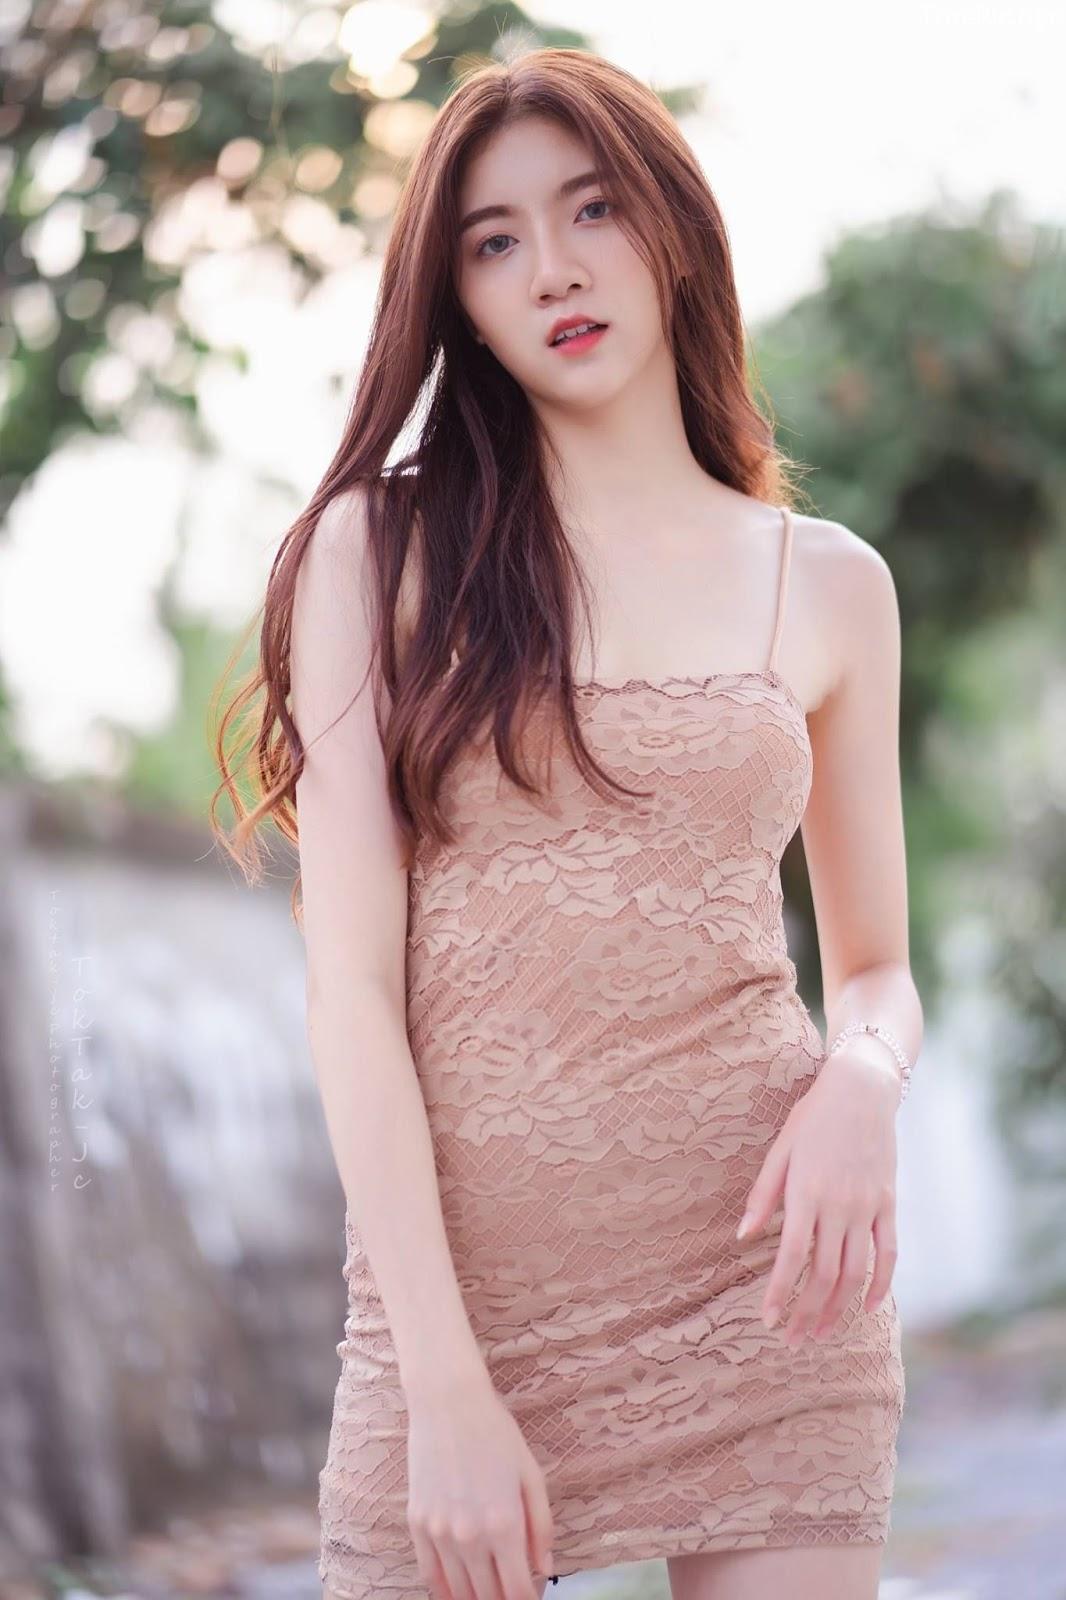 Thailand angel model Sasi Ngiunwan - Beauty portrait photoshoot - Picture 9